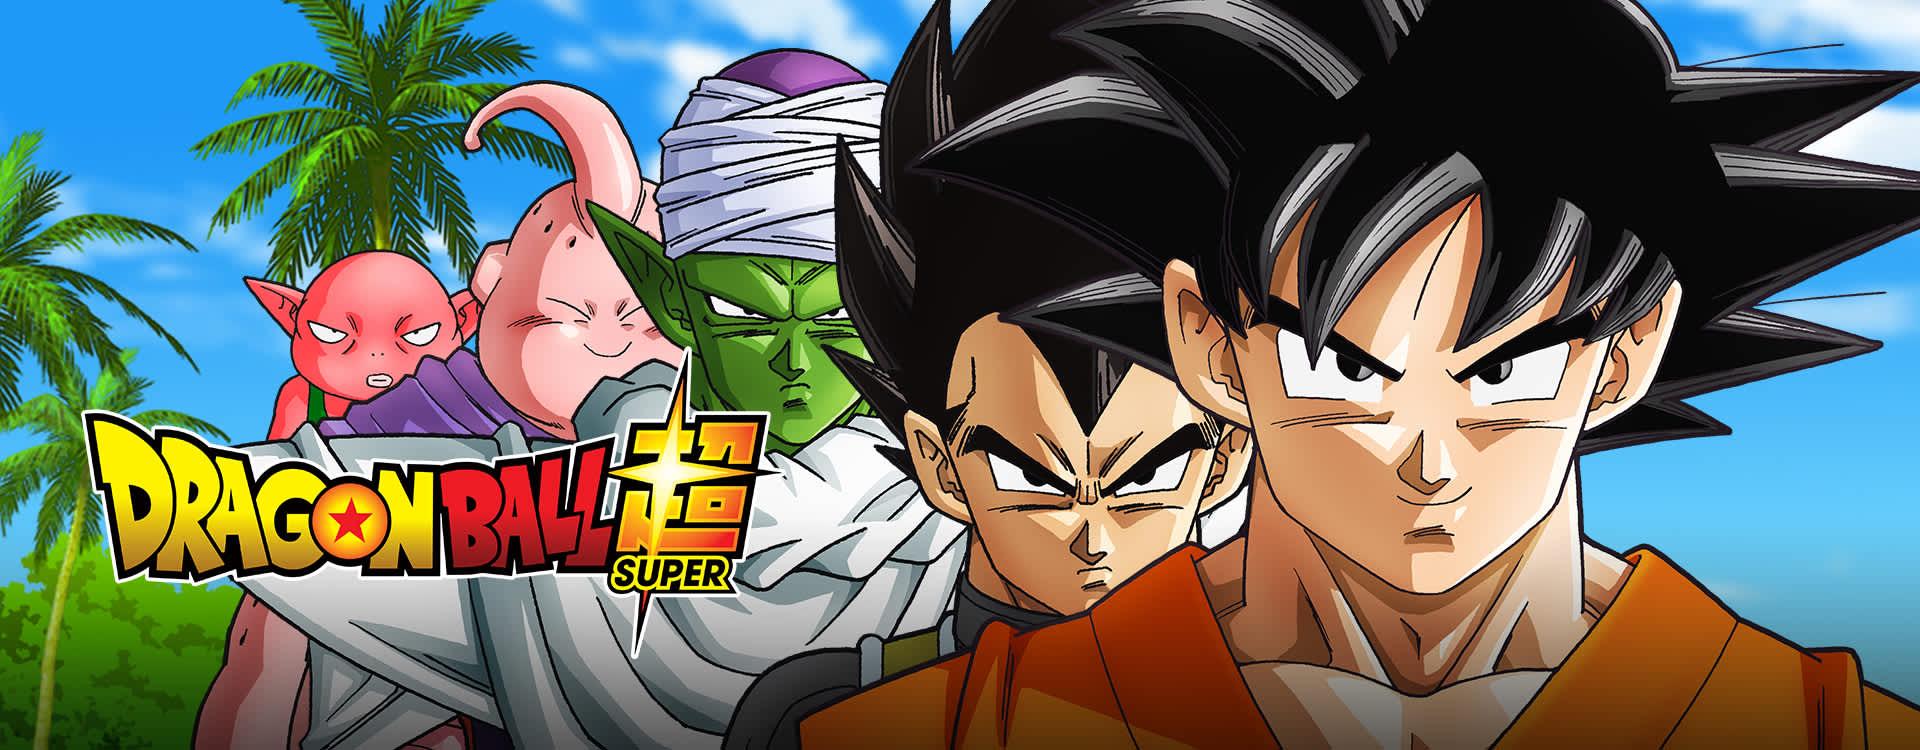 stream watch dragon ball super episodes online sub dub